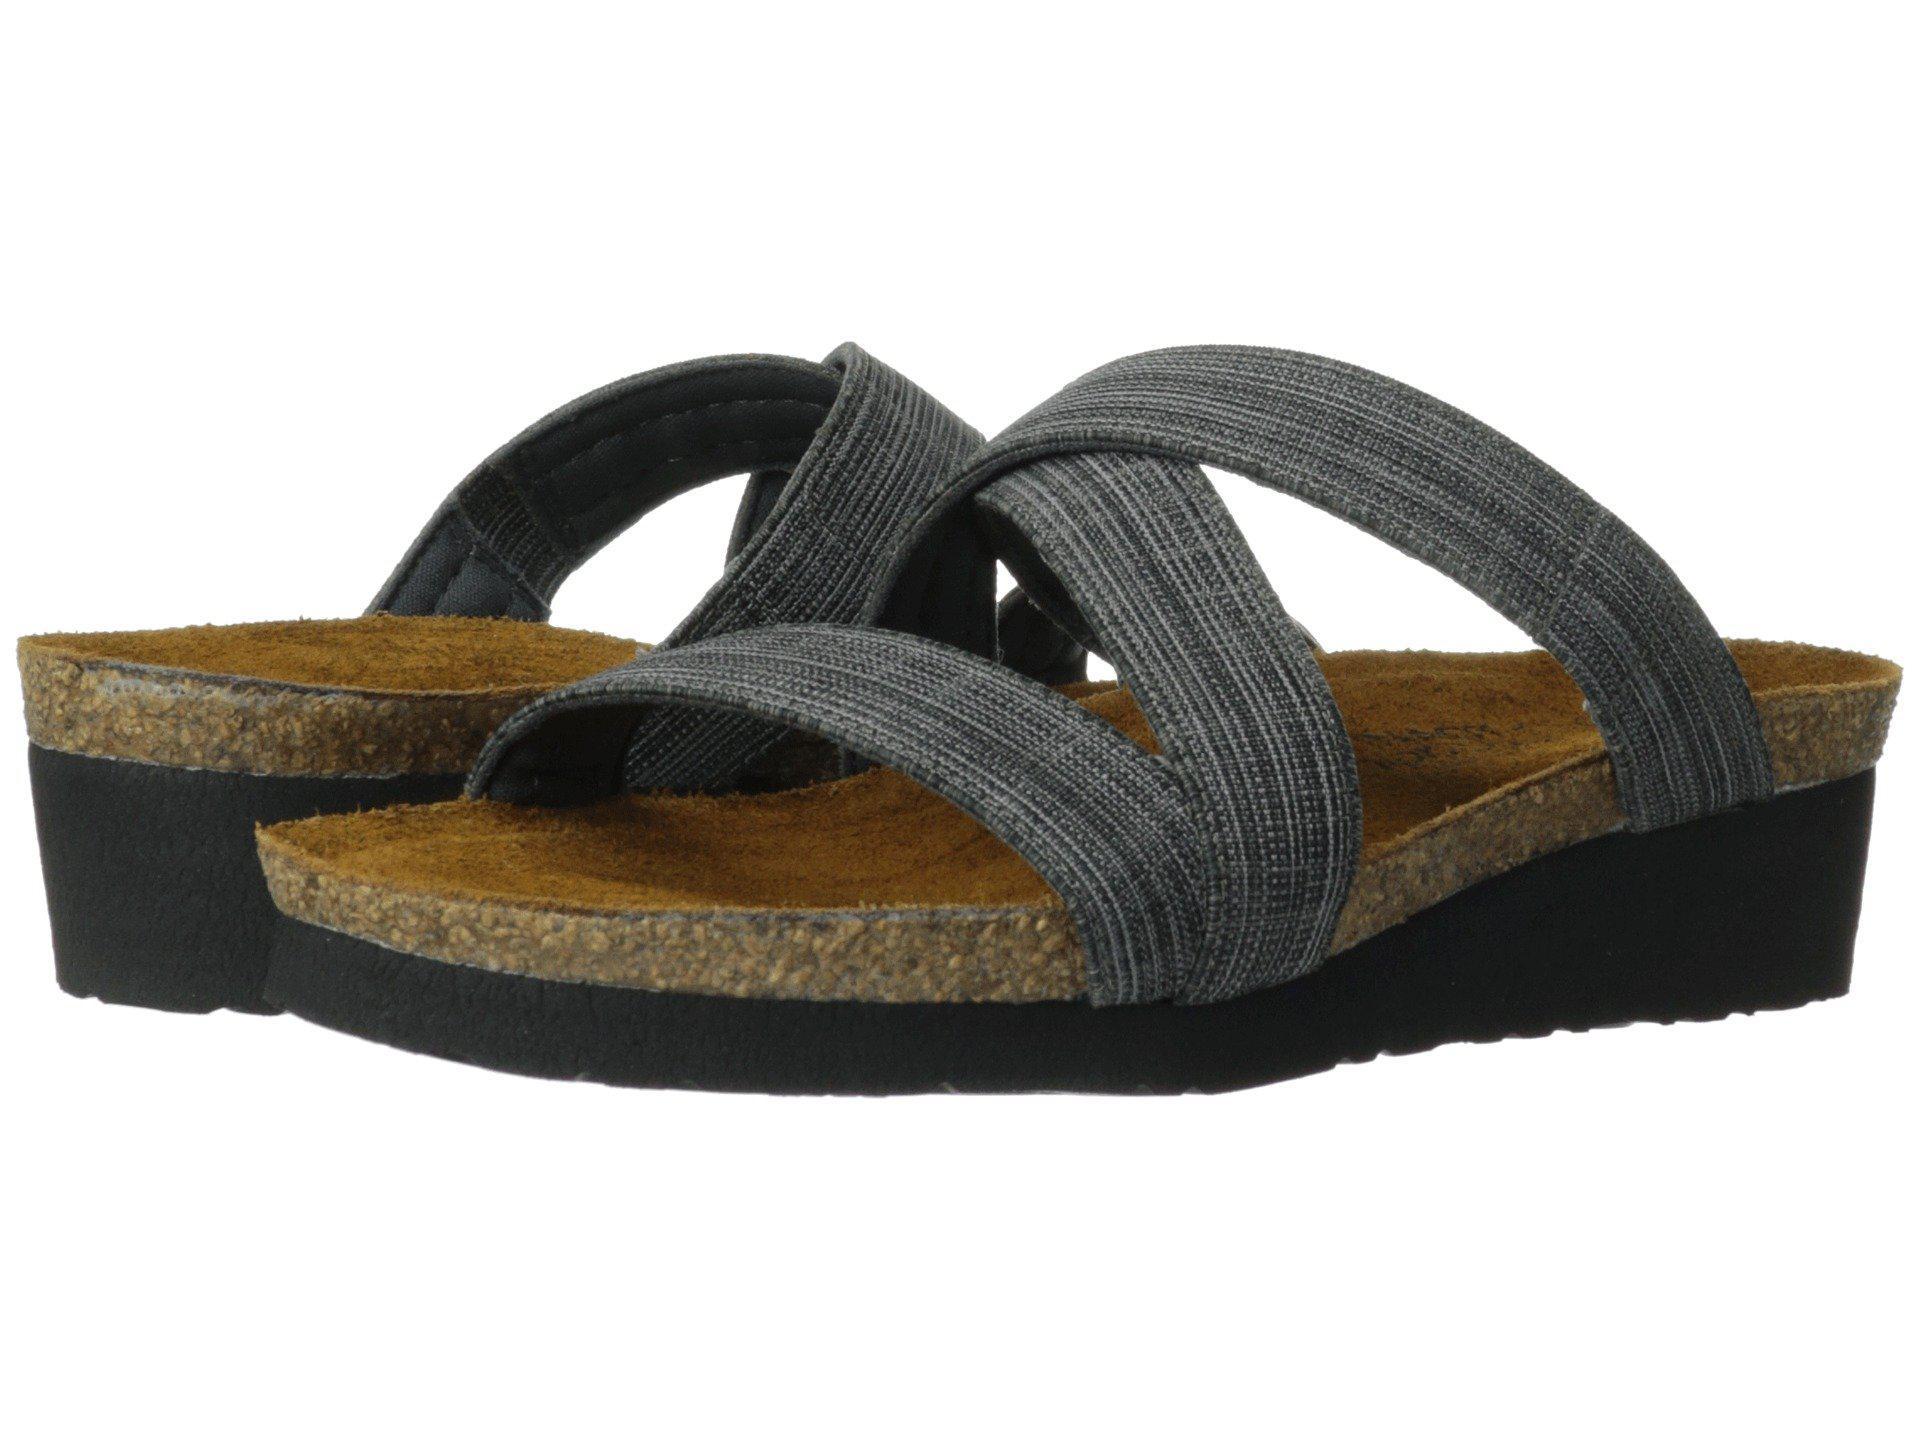 3be8577e1e1d Lyst - Naot Naomi (black Fabric) Women s Shoes in Black